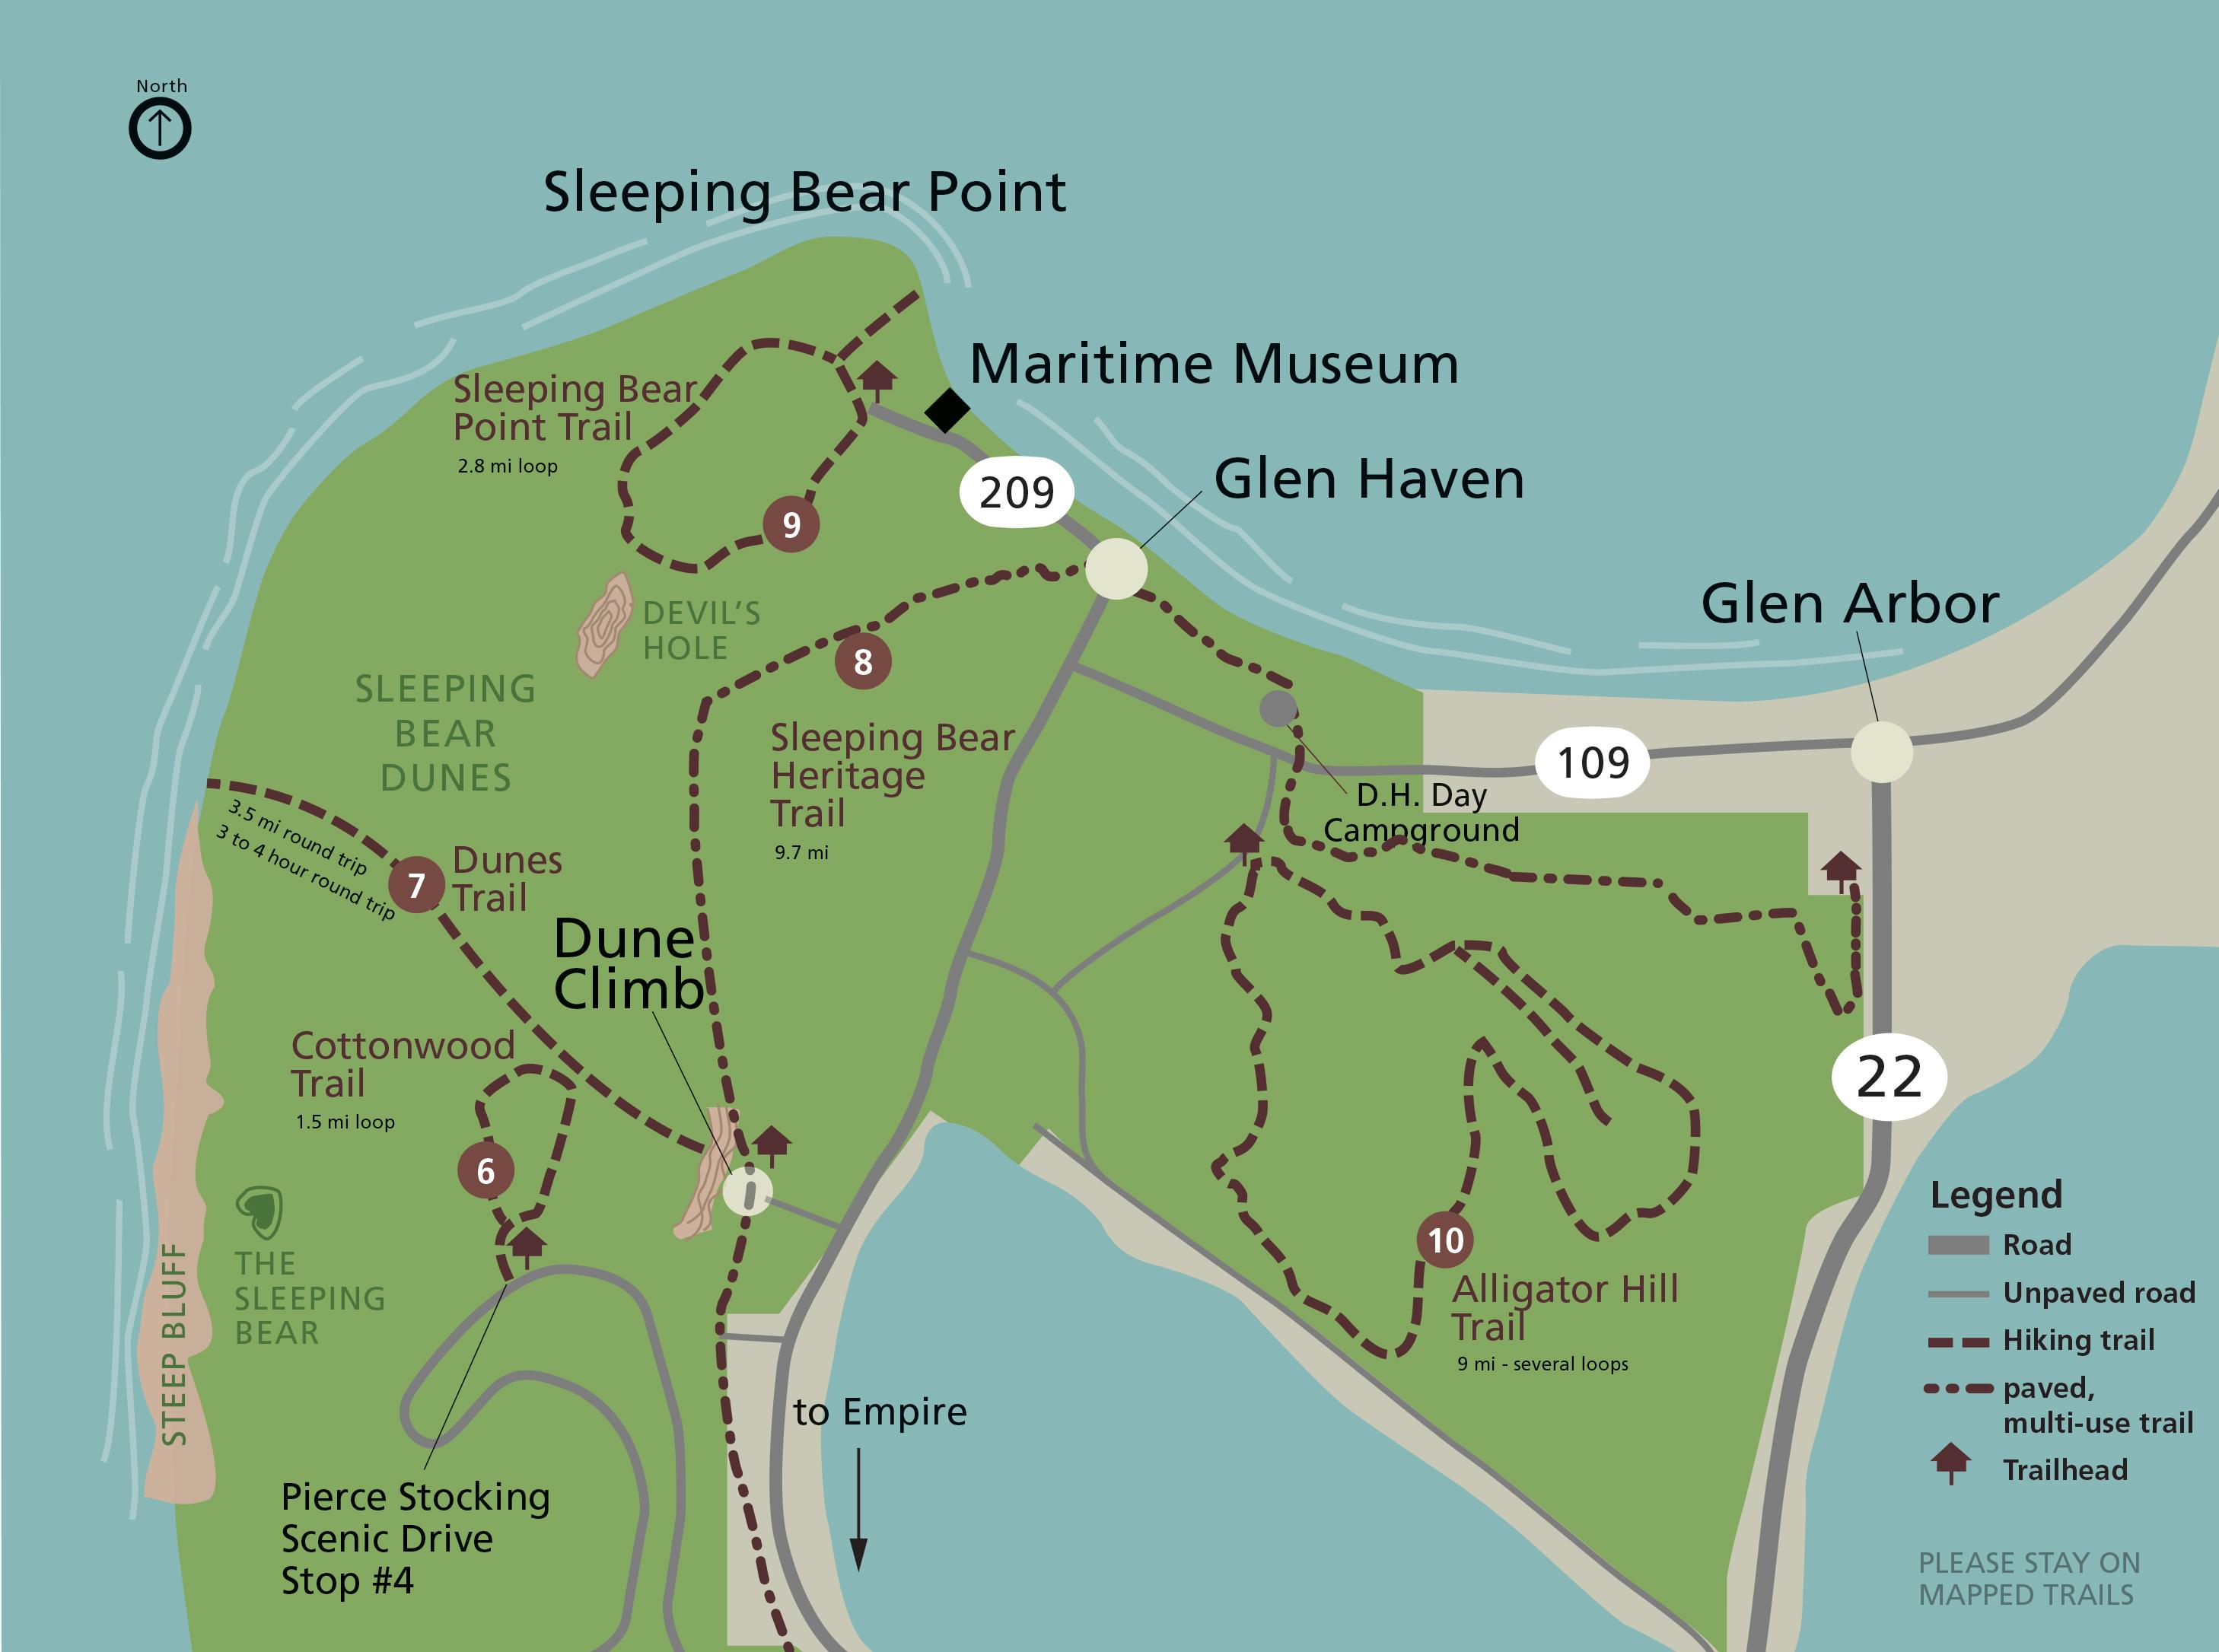 Sleeping Bear Point Trail